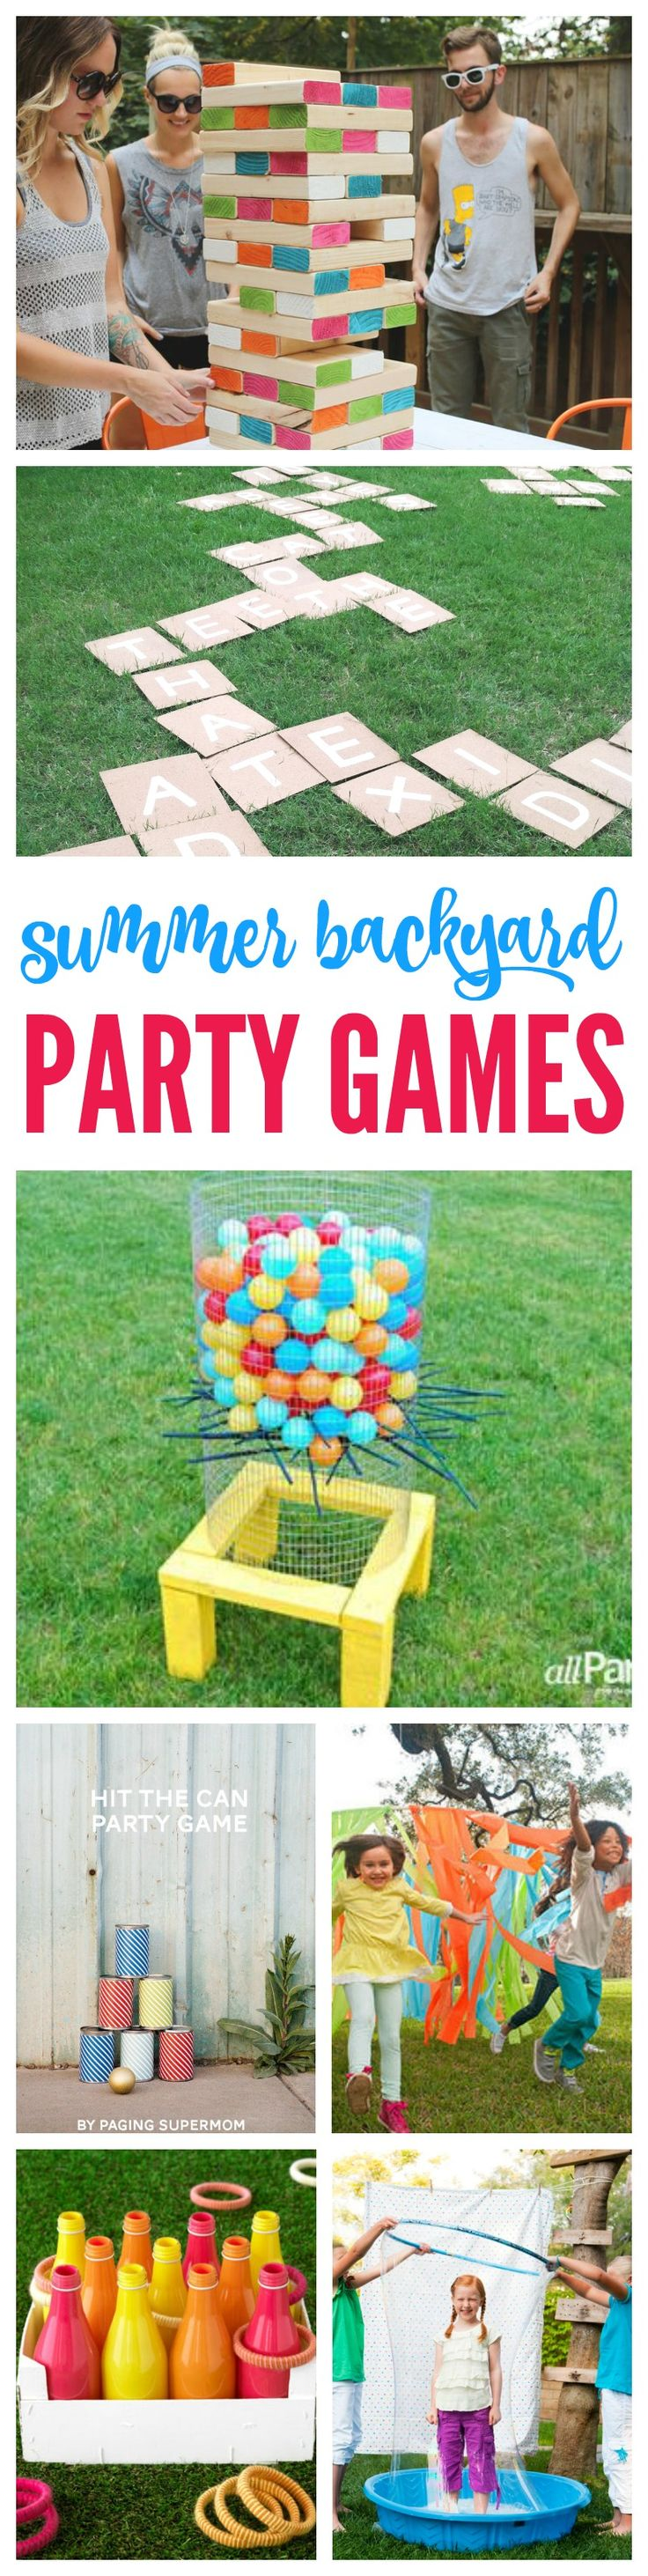 Fun Summer Party Games